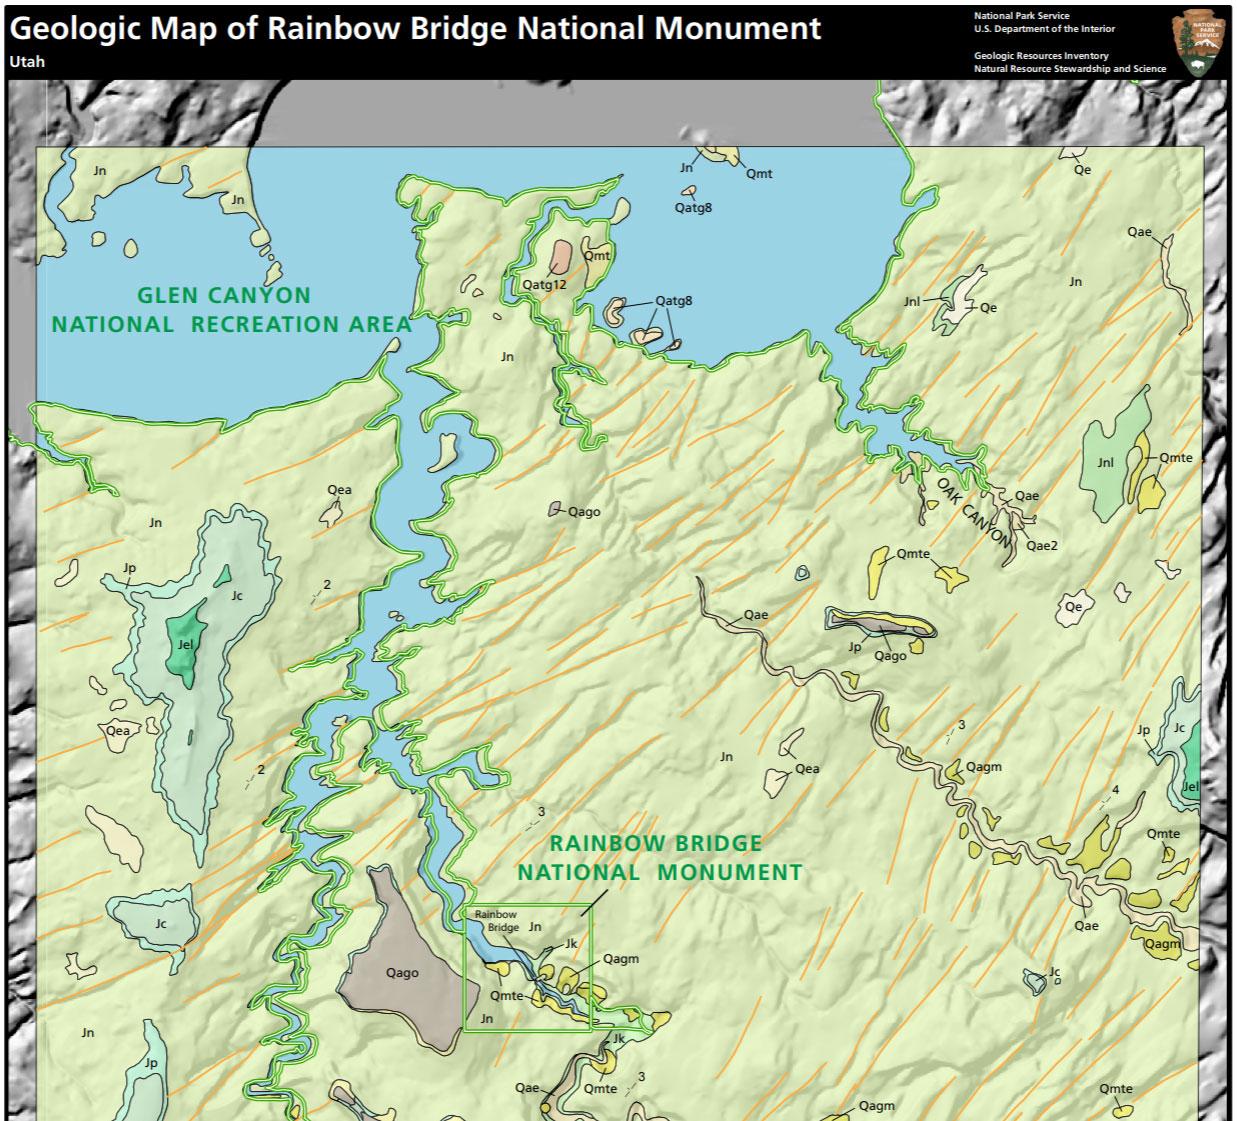 Nps Geodiversity Atlas Rainbow Bridge National Monument Utah U S National Park Service